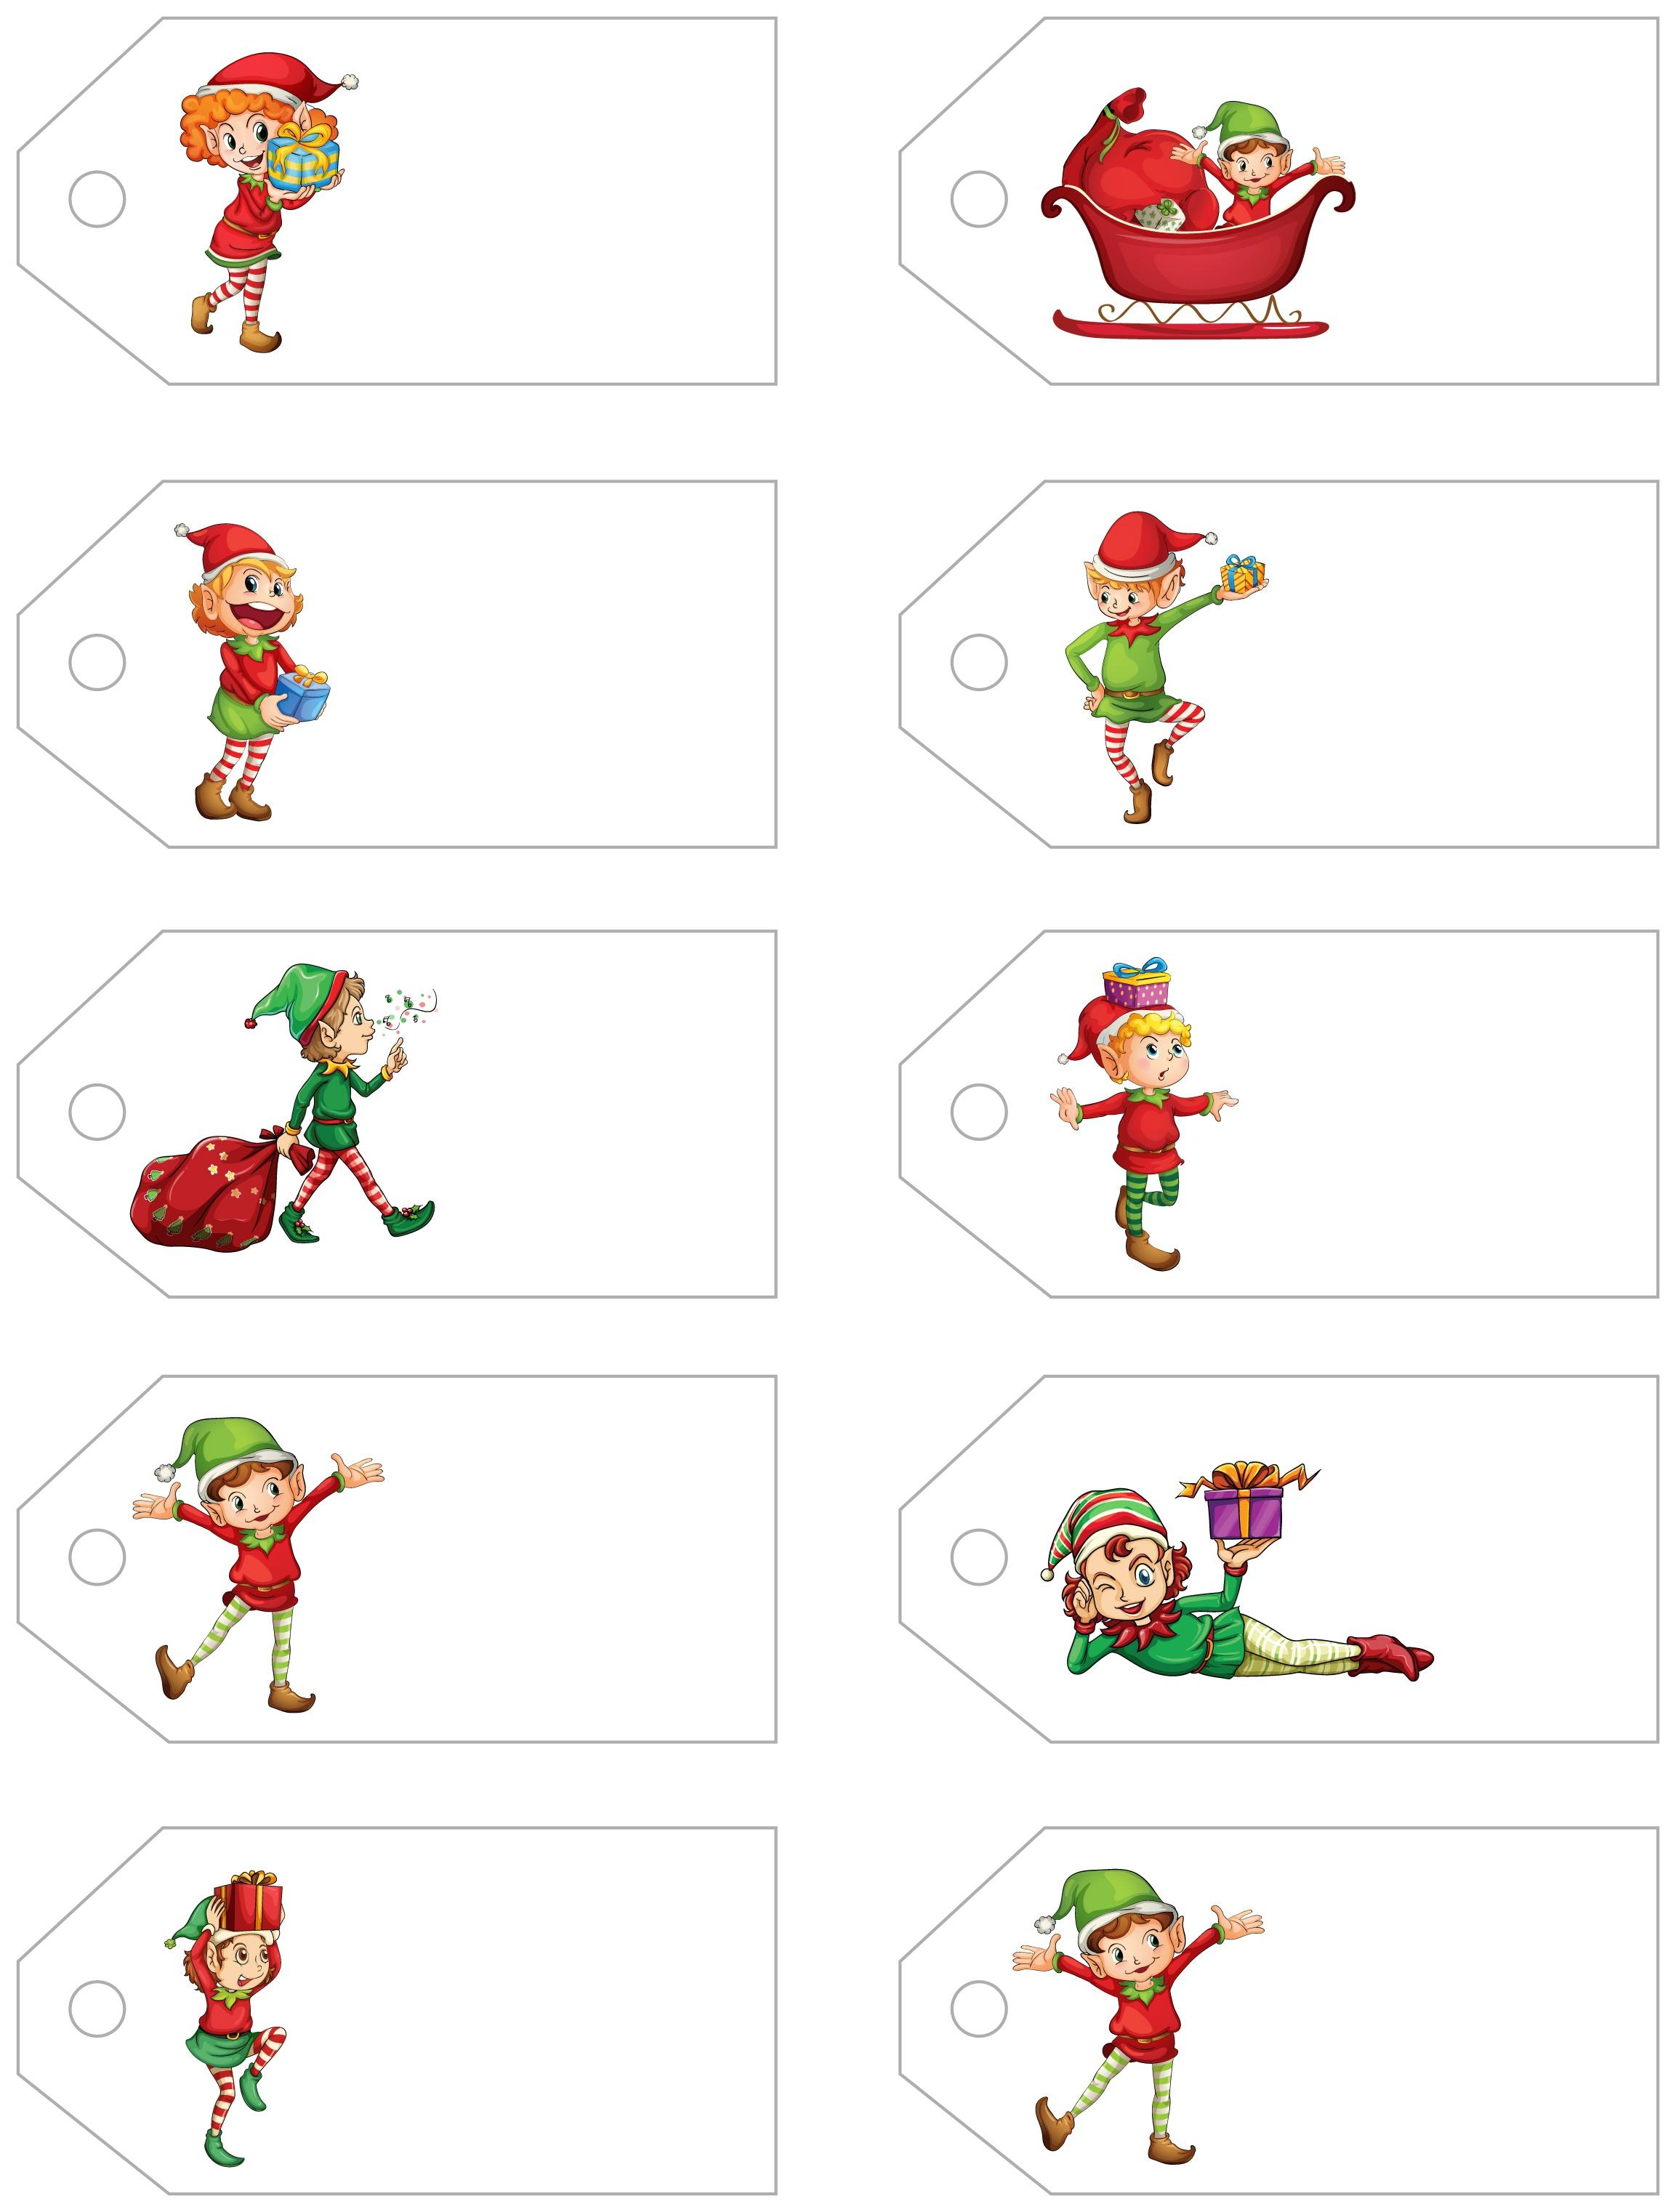 Santa's Little Gift To You! Free Printable Gift Tags And Labels - Free Printable Christmas Gift Tags